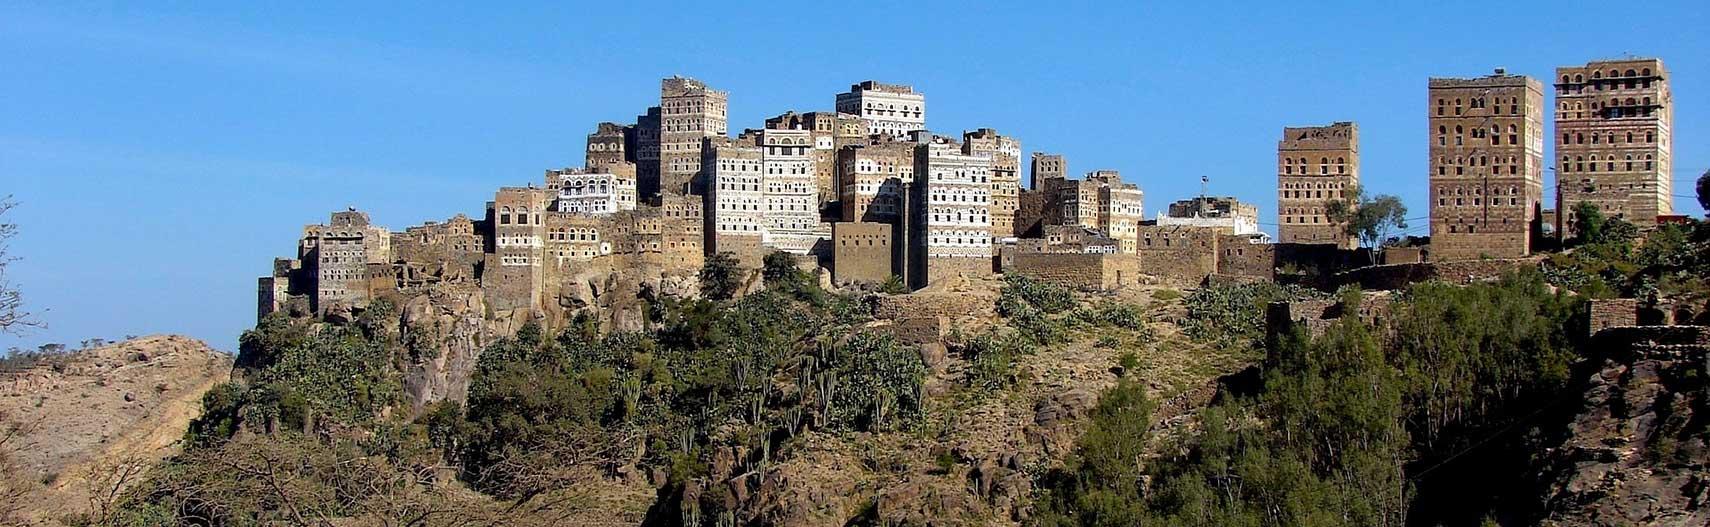 Al-Hajjarah-Yemen.jpg